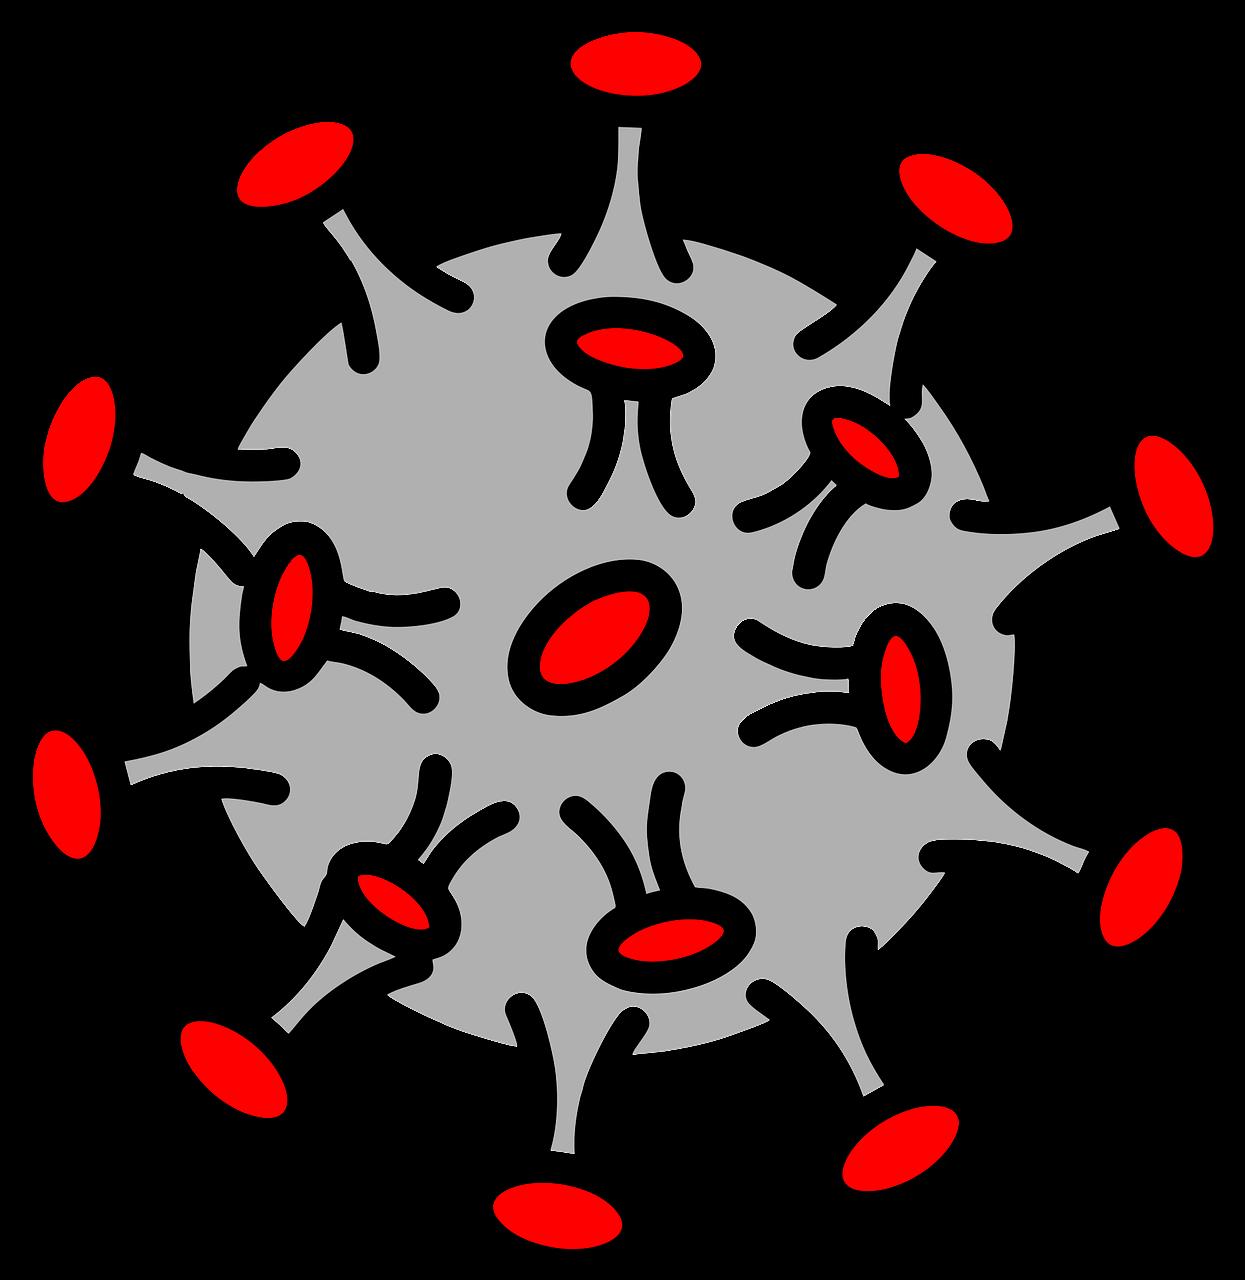 Gambar Virus Corona Vector Clipart Full Size Clipart 5340647 Pinclipart